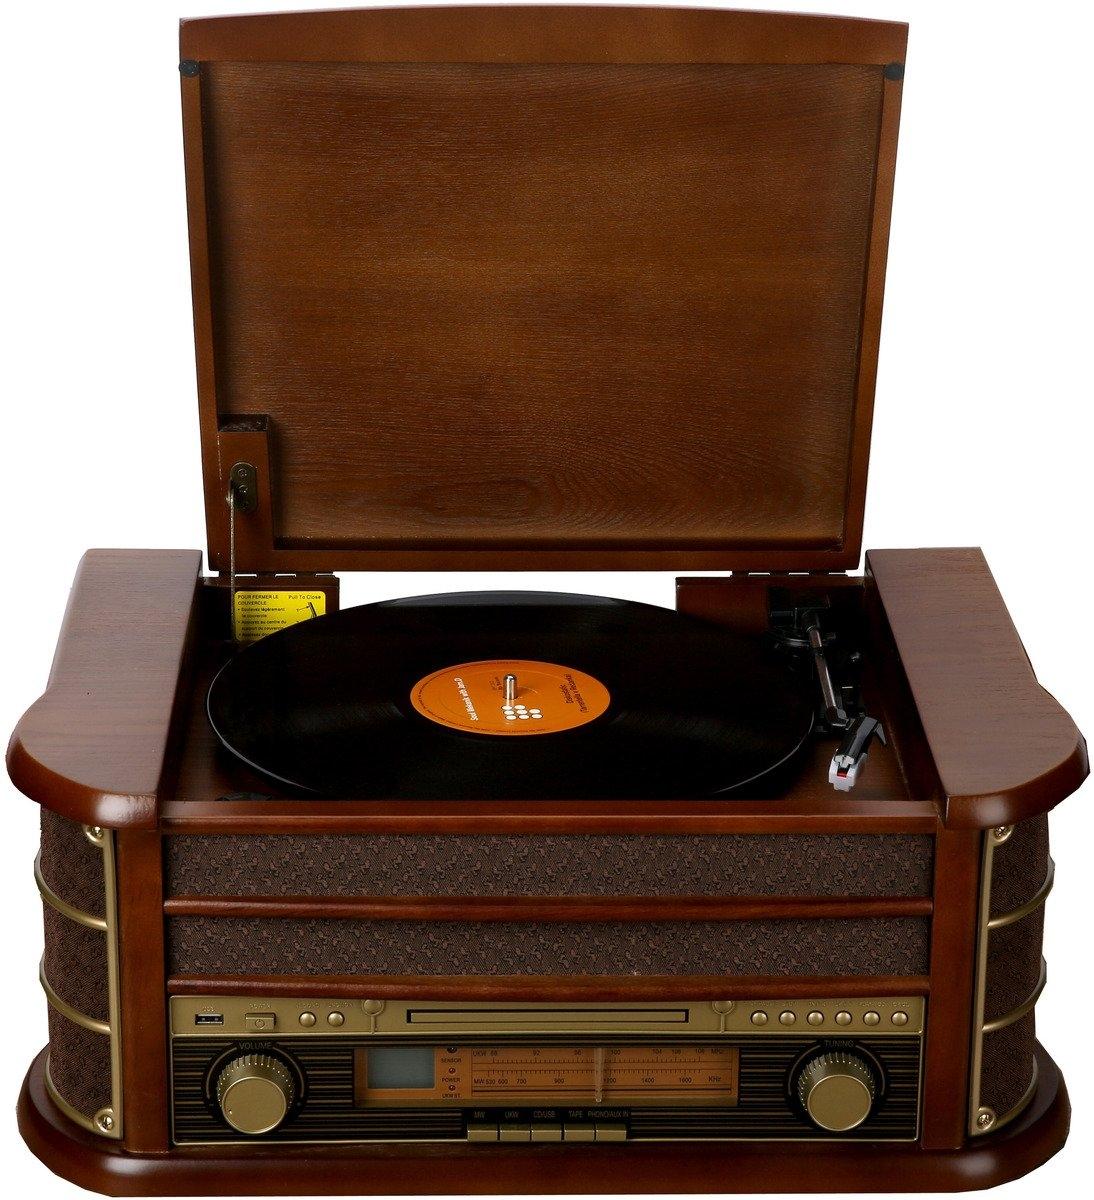 Denver radio »Retro music-center met platenspeler MCR-50« - gratis ruilen op otto.nl